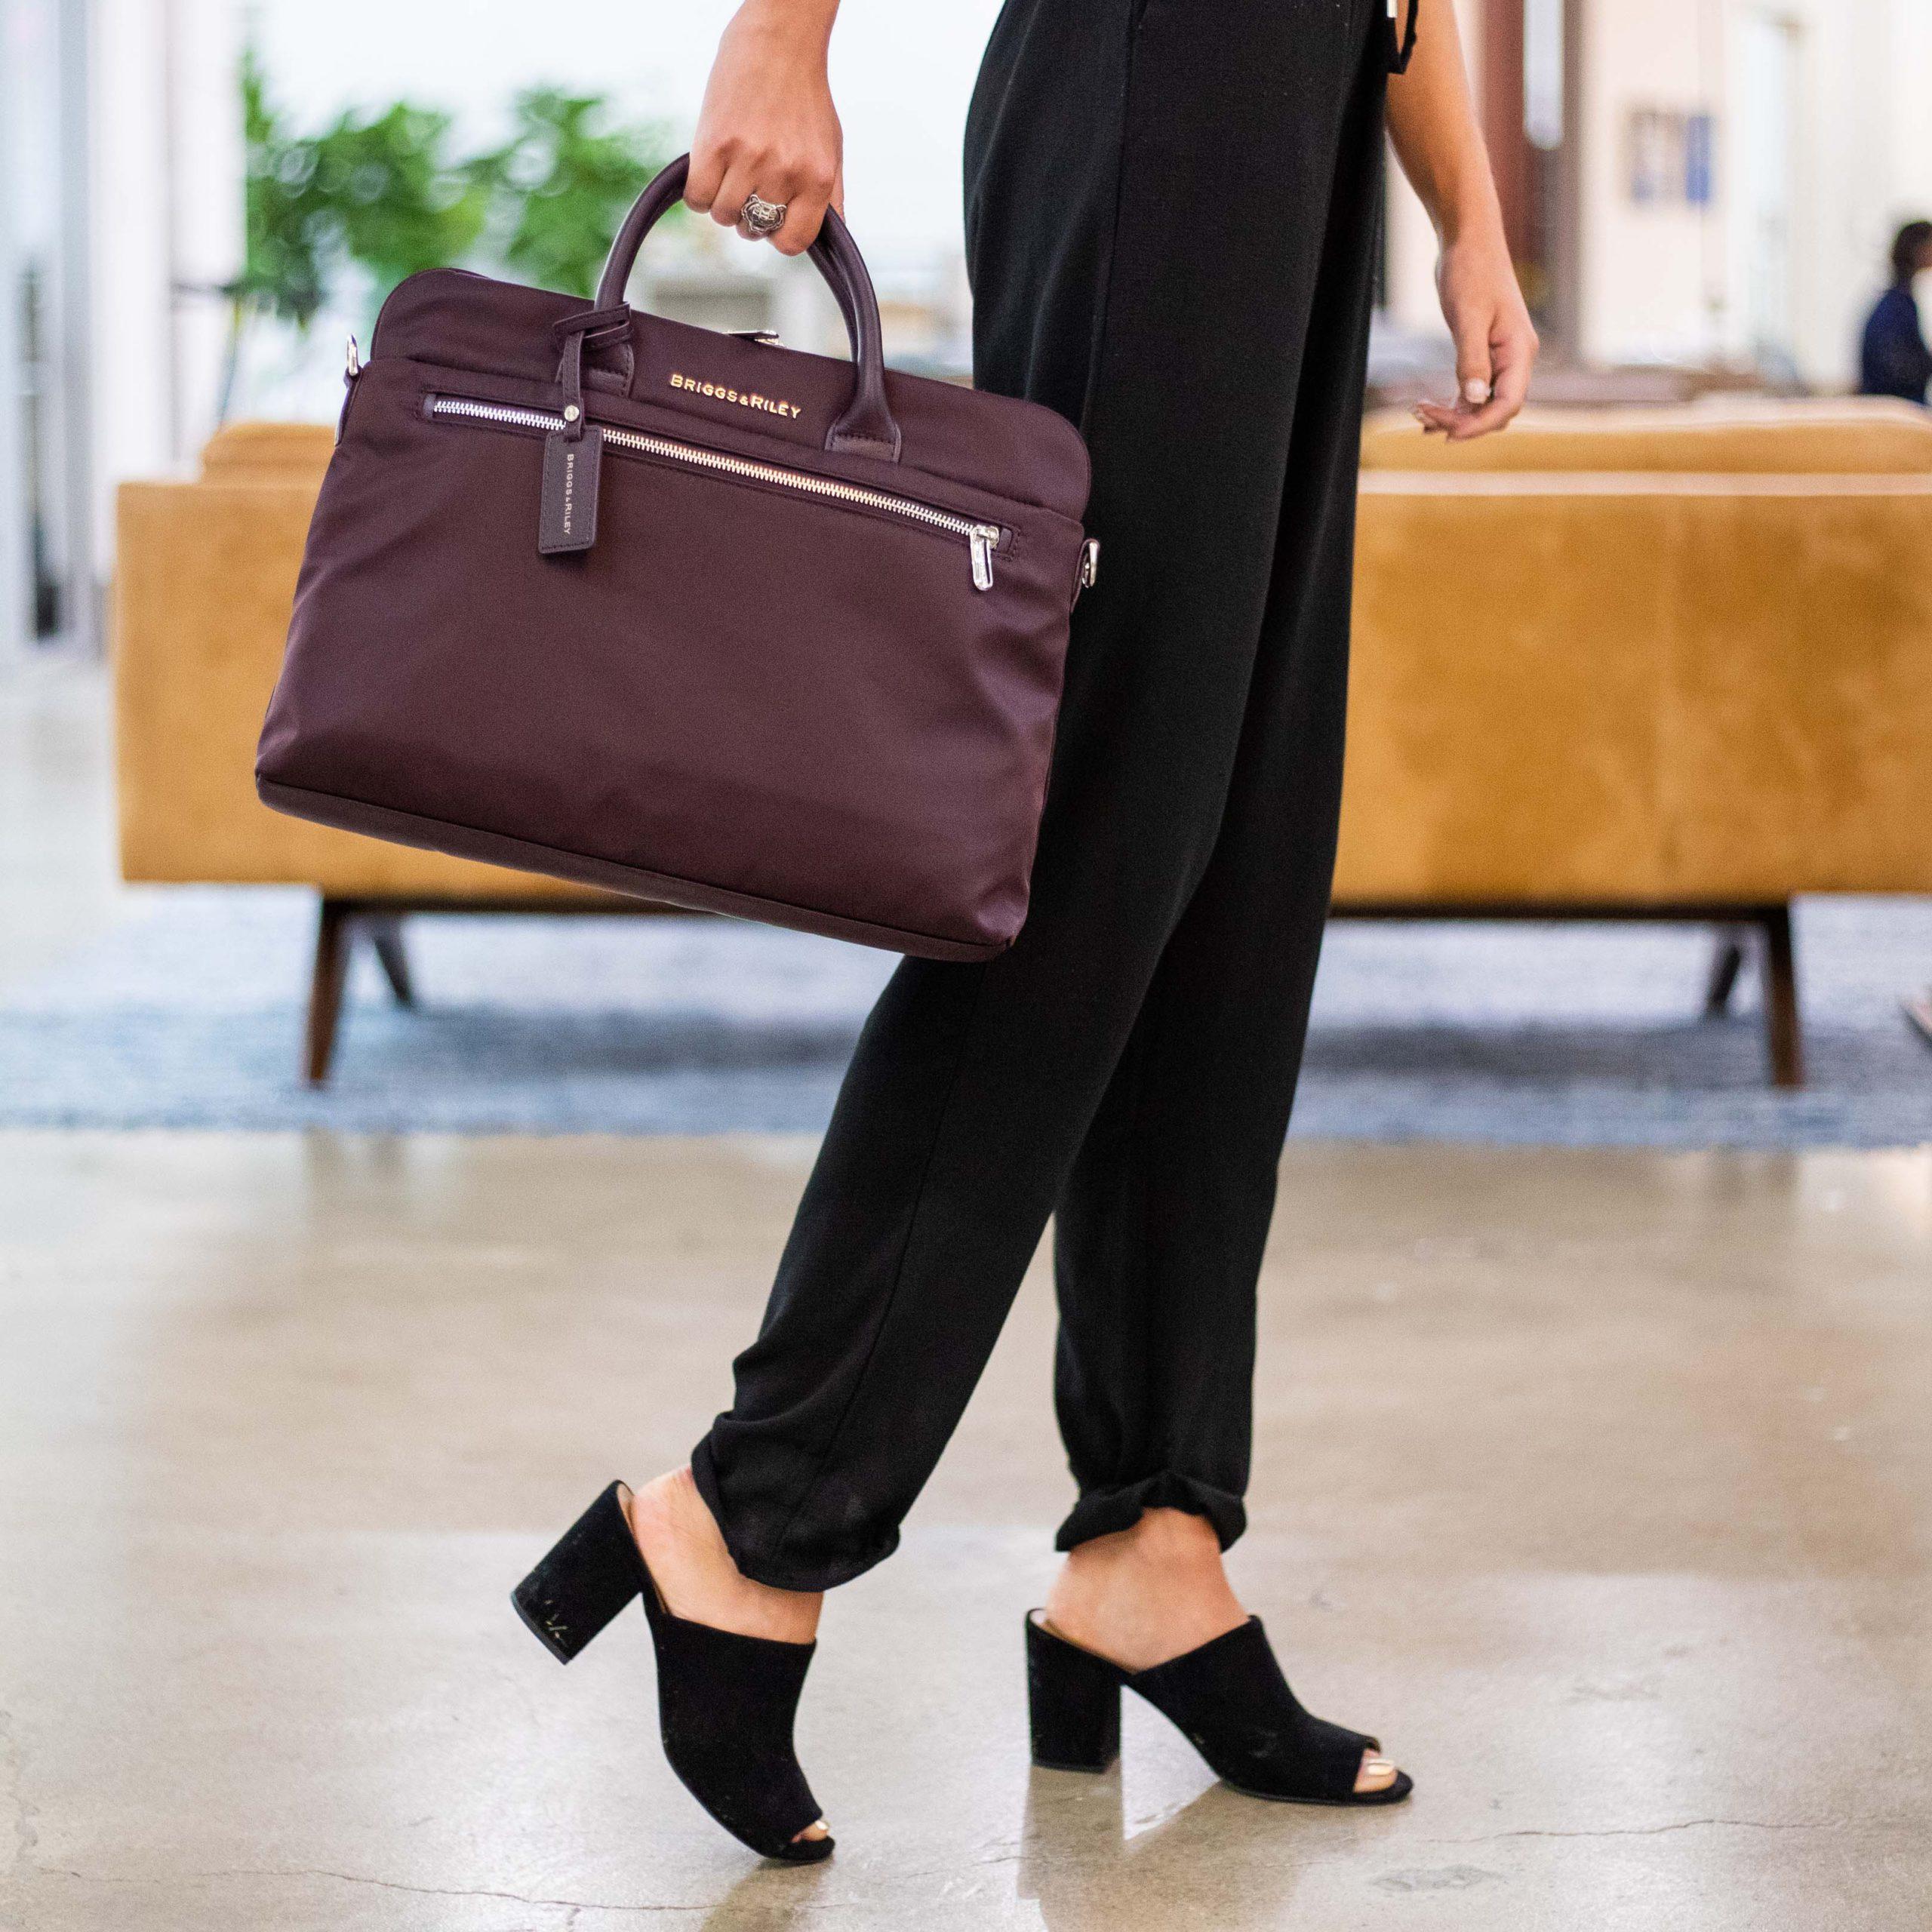 Rhapsody plum briefcase